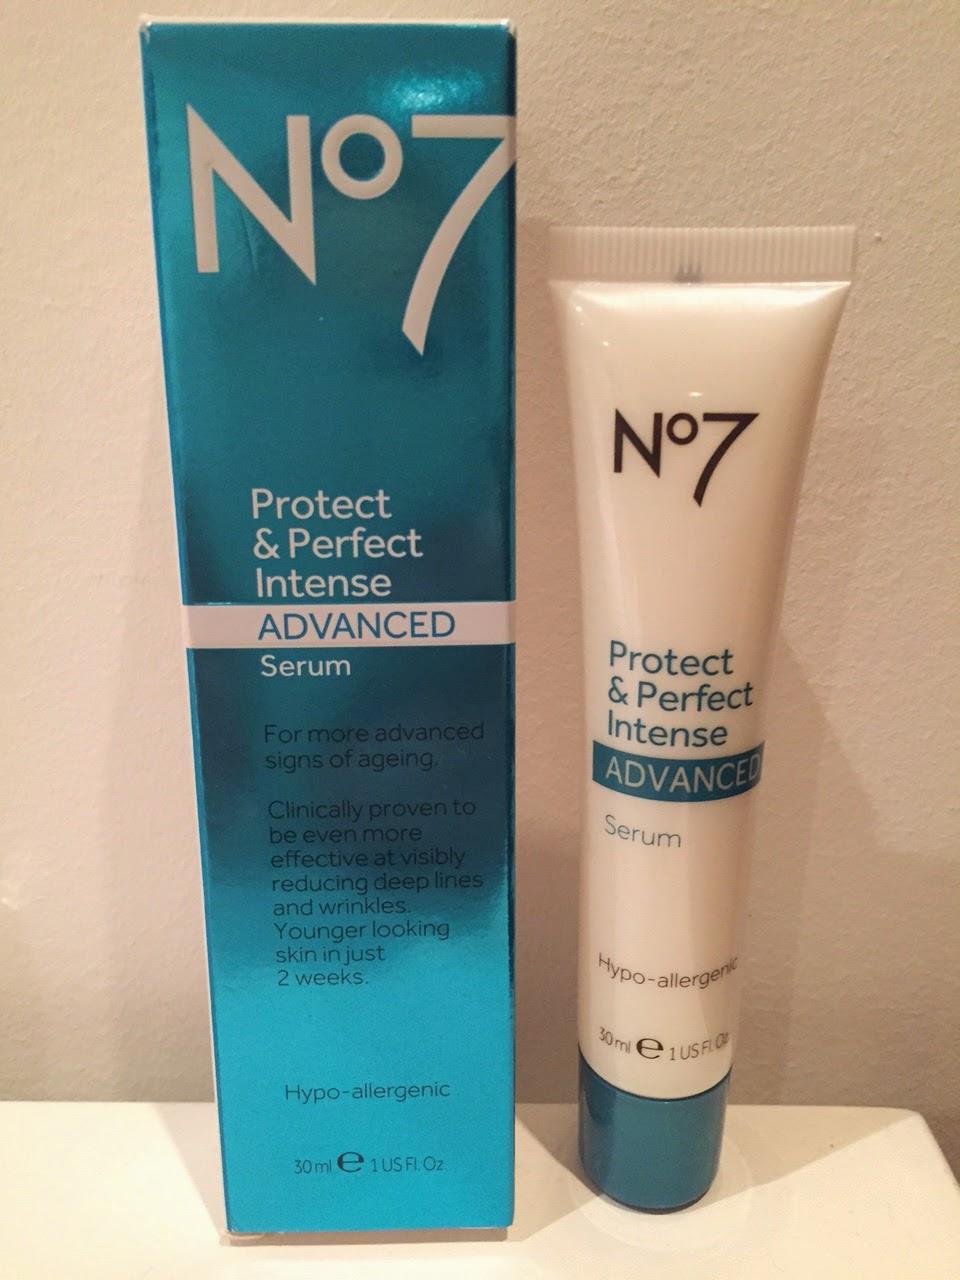 No 7 protect and perfect intense serum reviews